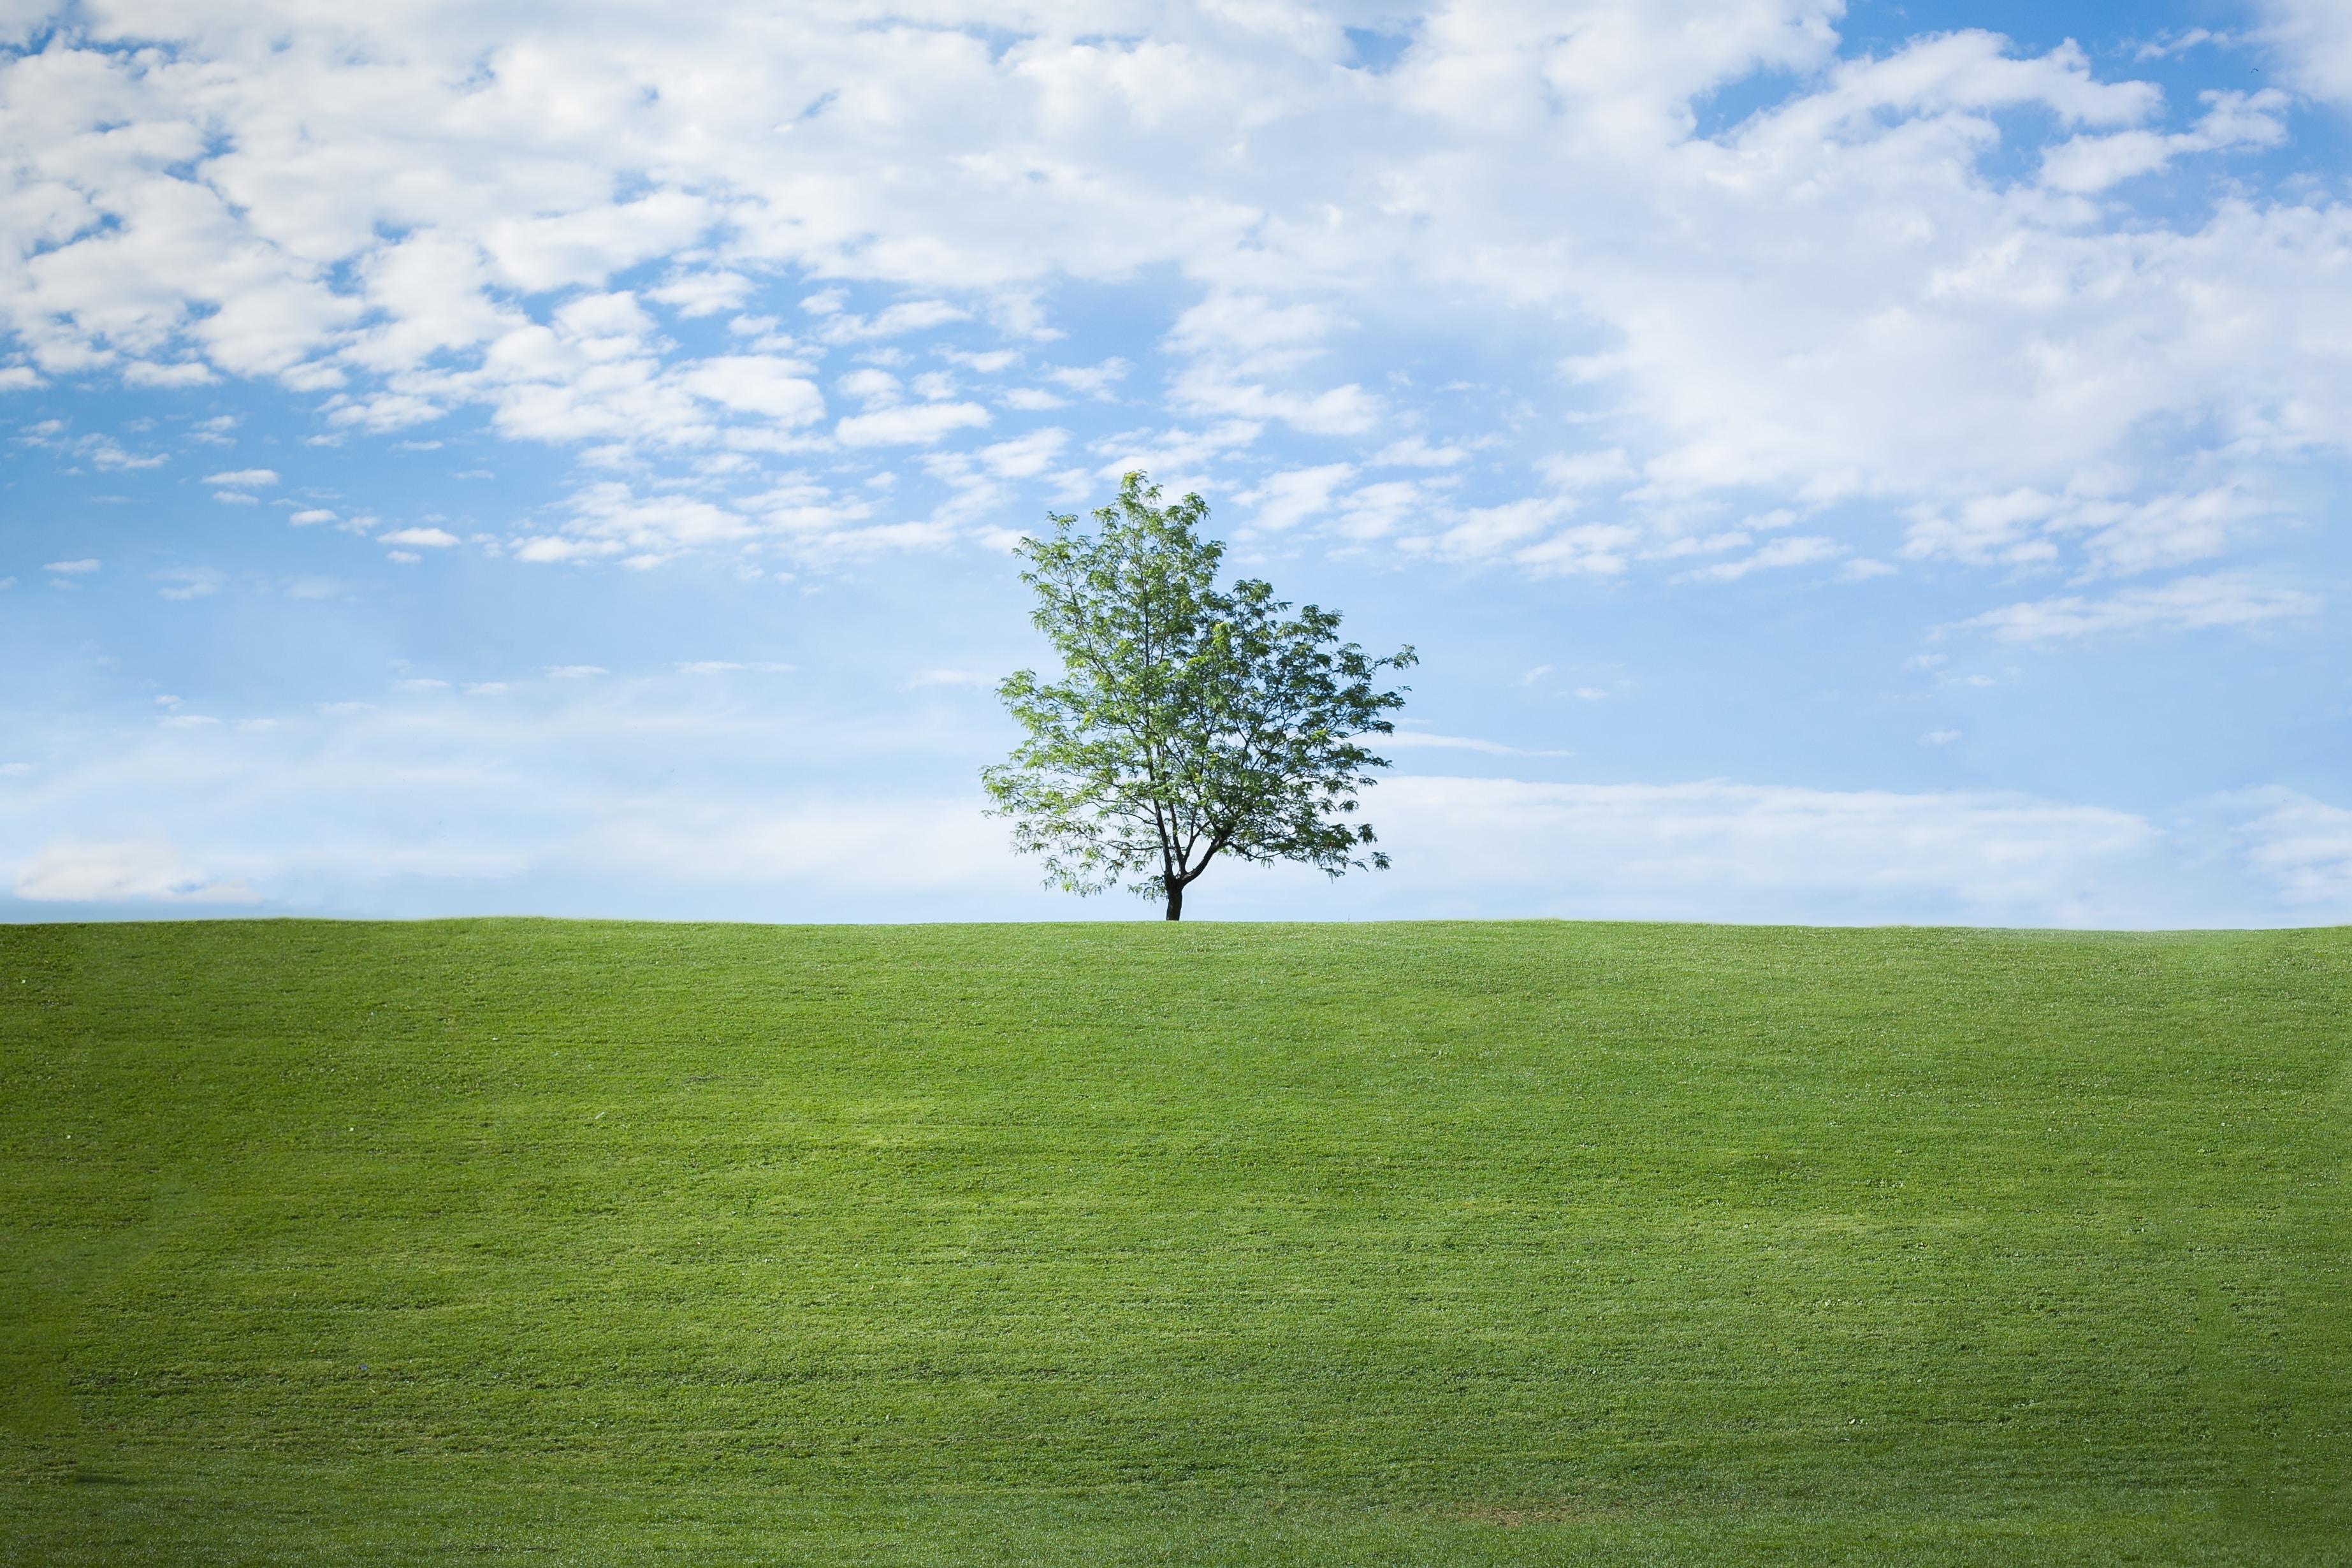 The Apple Tree stories